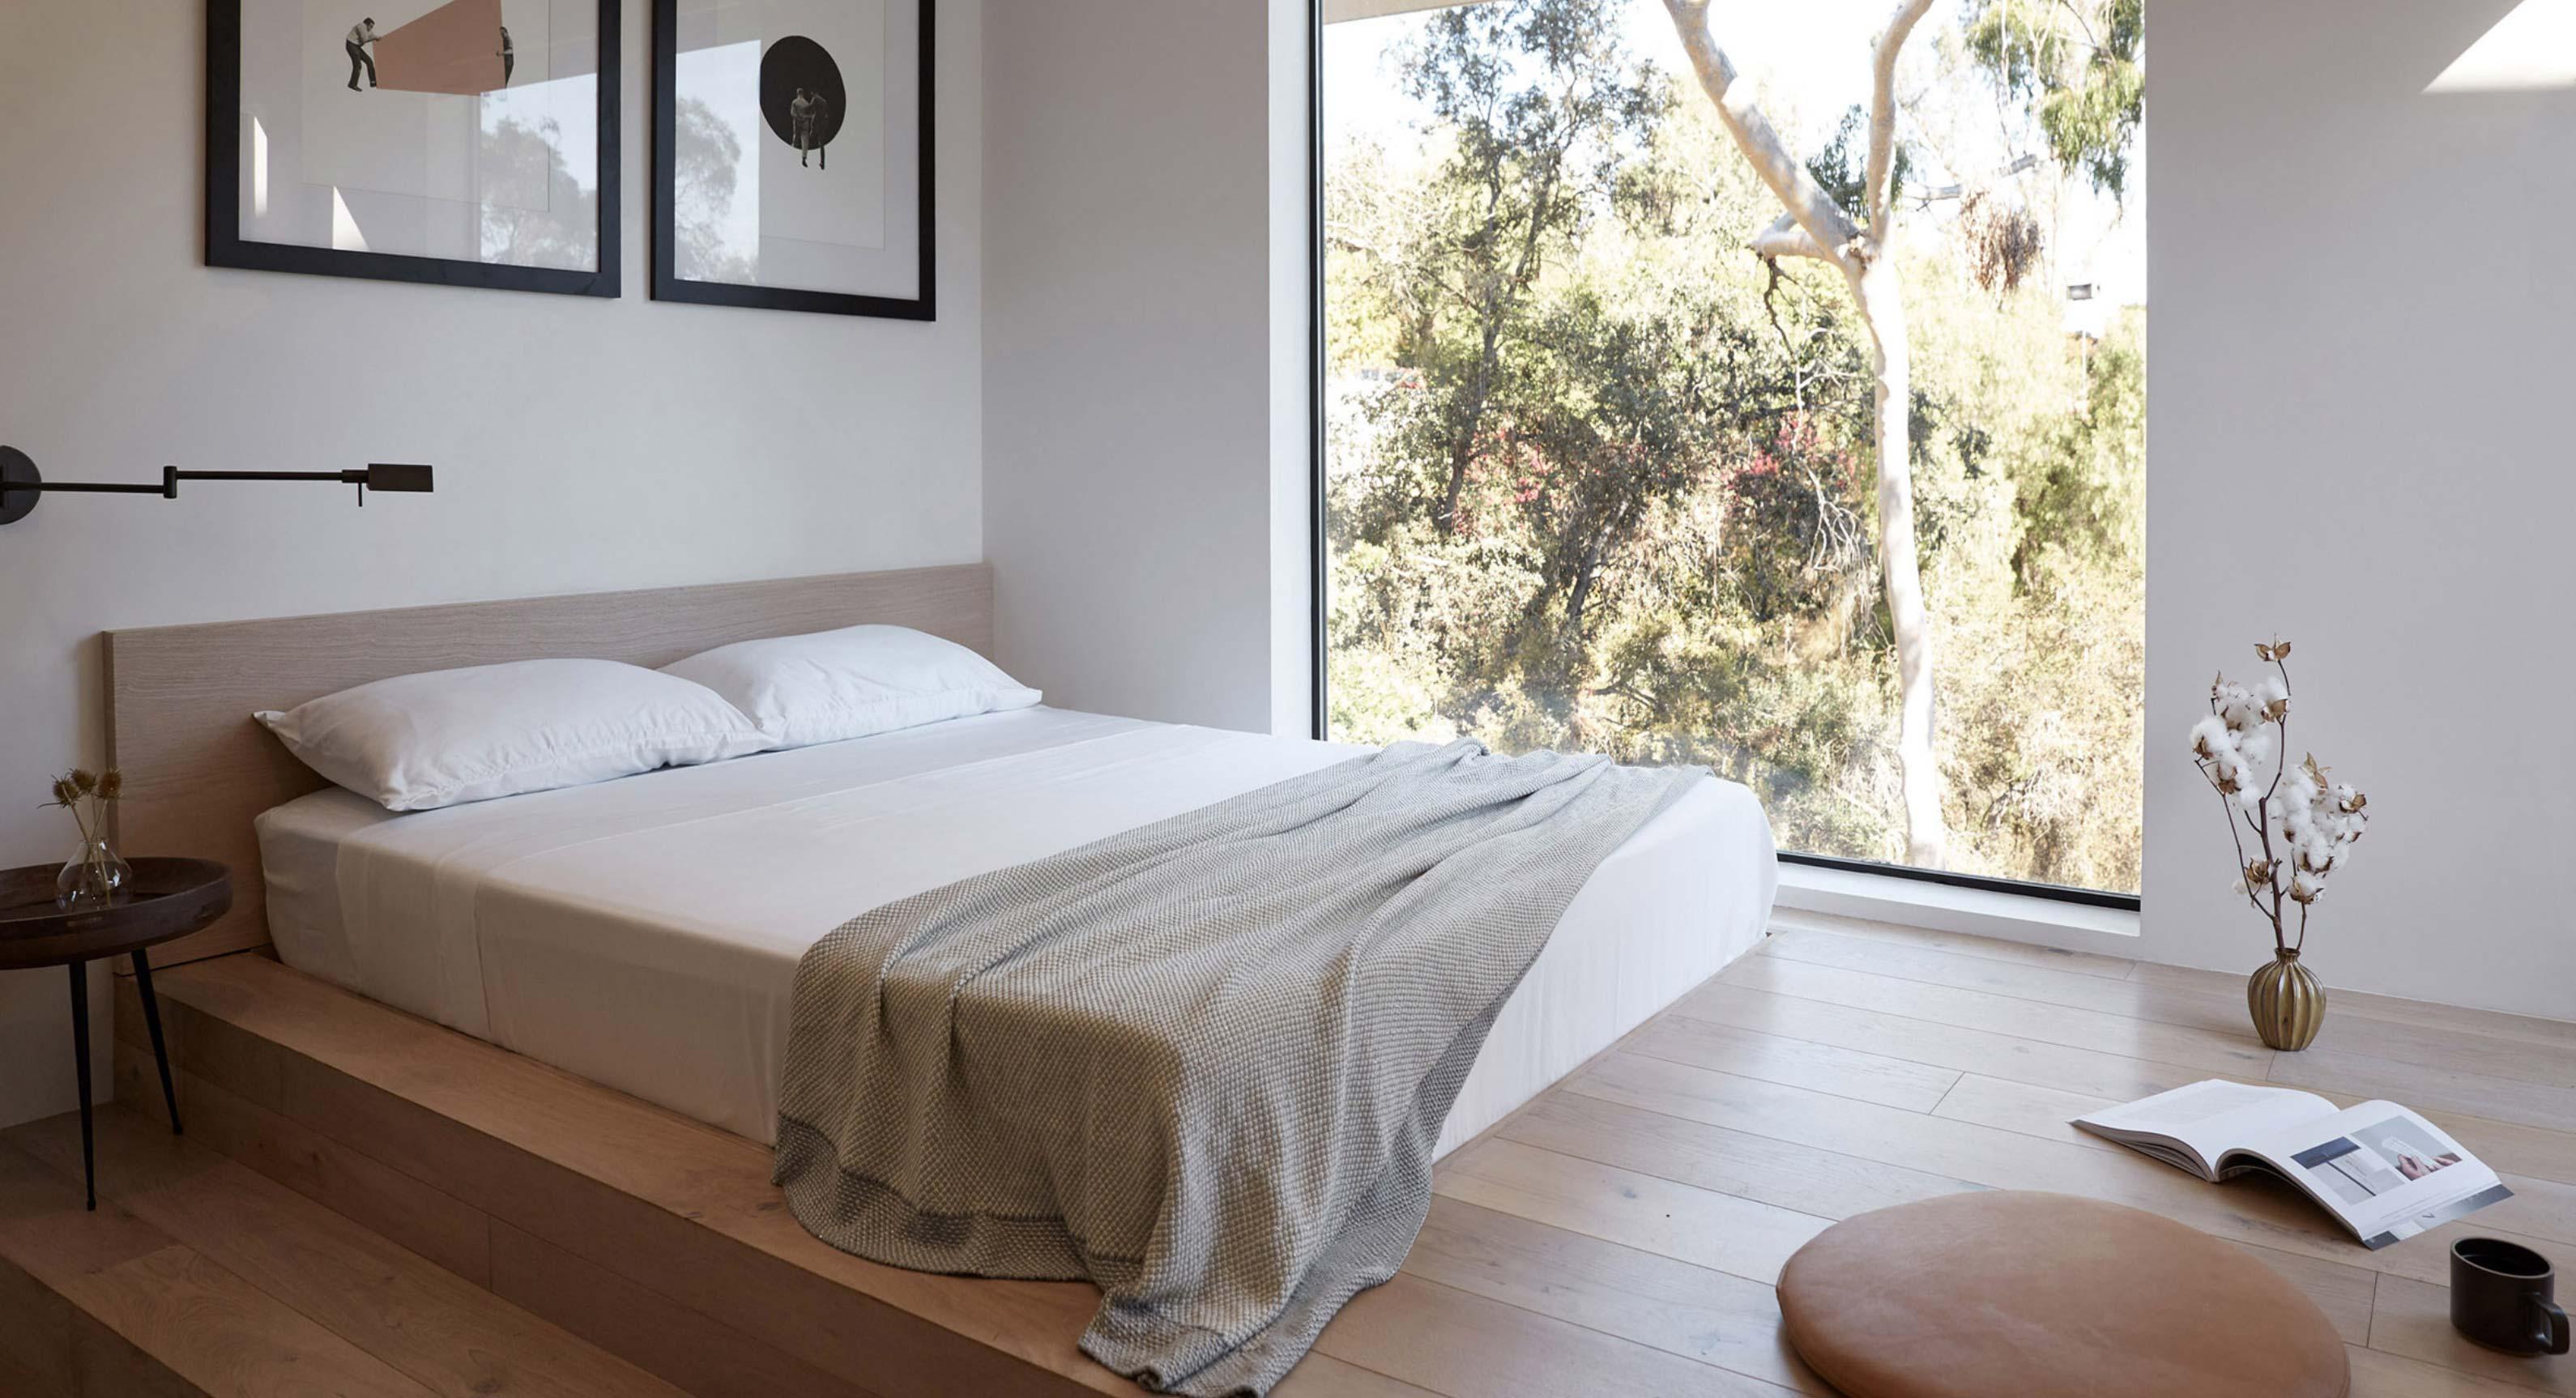 A Rare & Relaxed Retreat: Teresa Xu's Minimalist San Diego Holiday Home